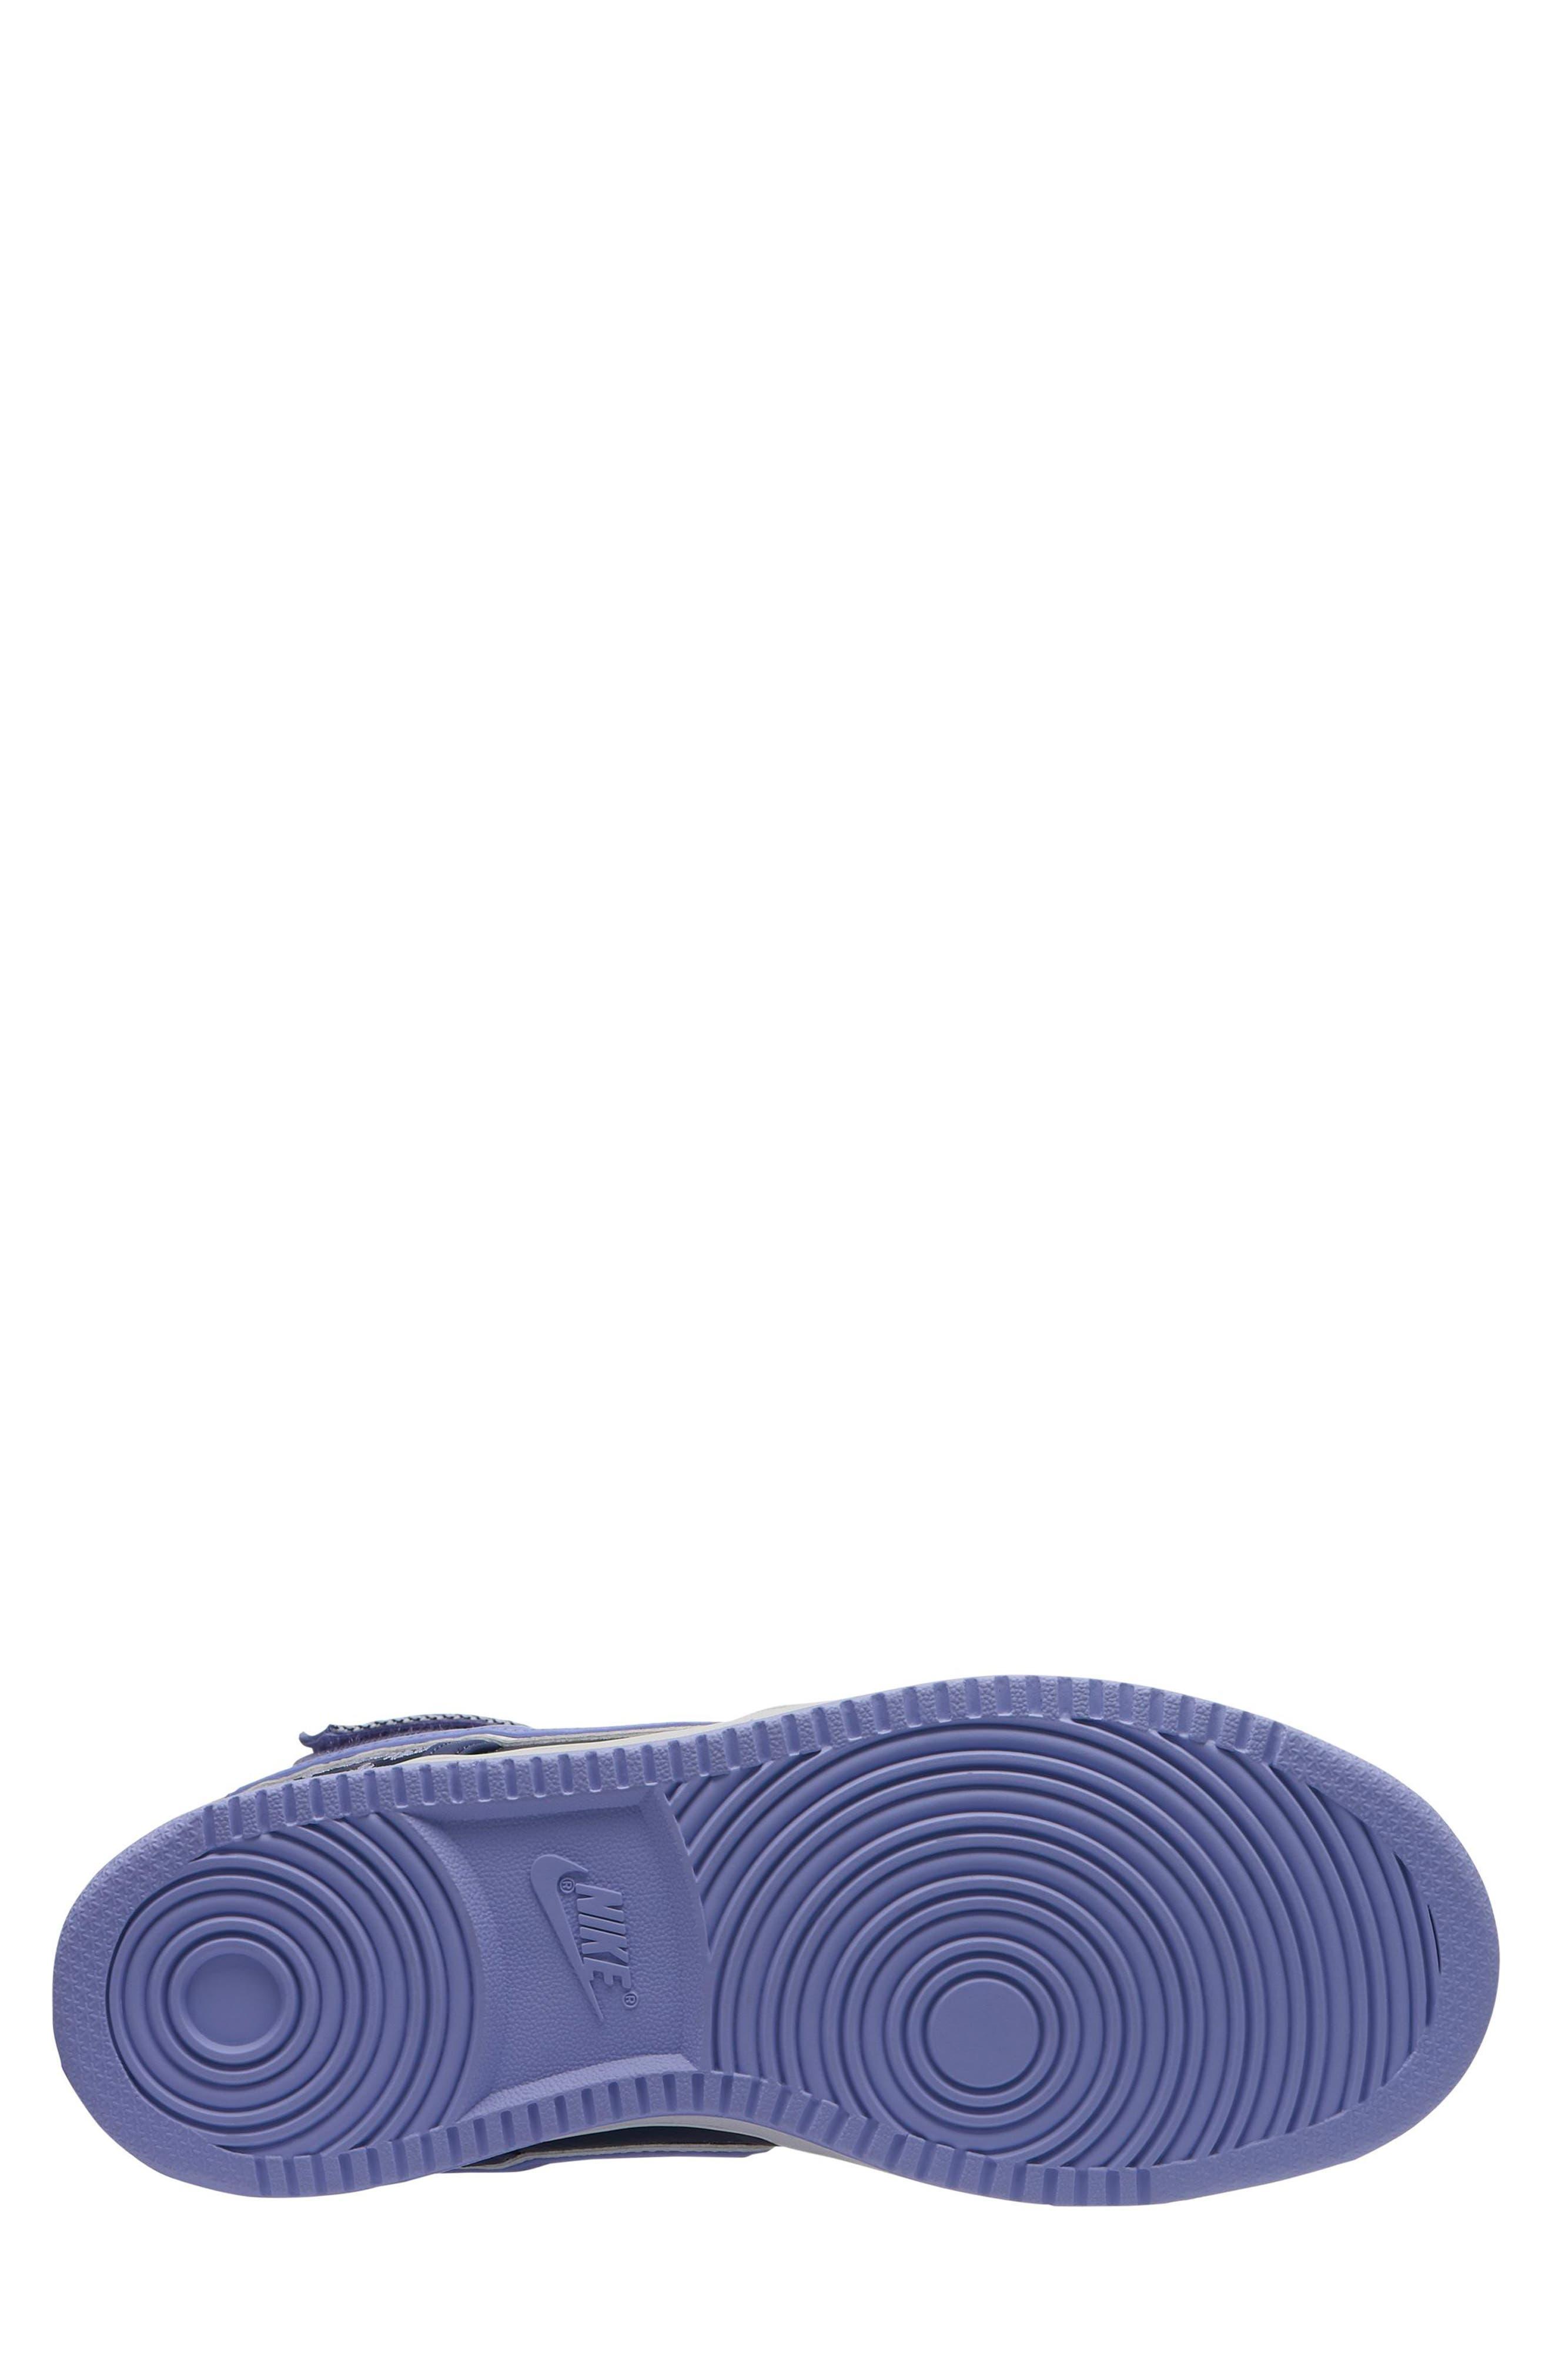 NIKE, Vandal High Lux Sneaker, Alternate thumbnail 2, color, 401